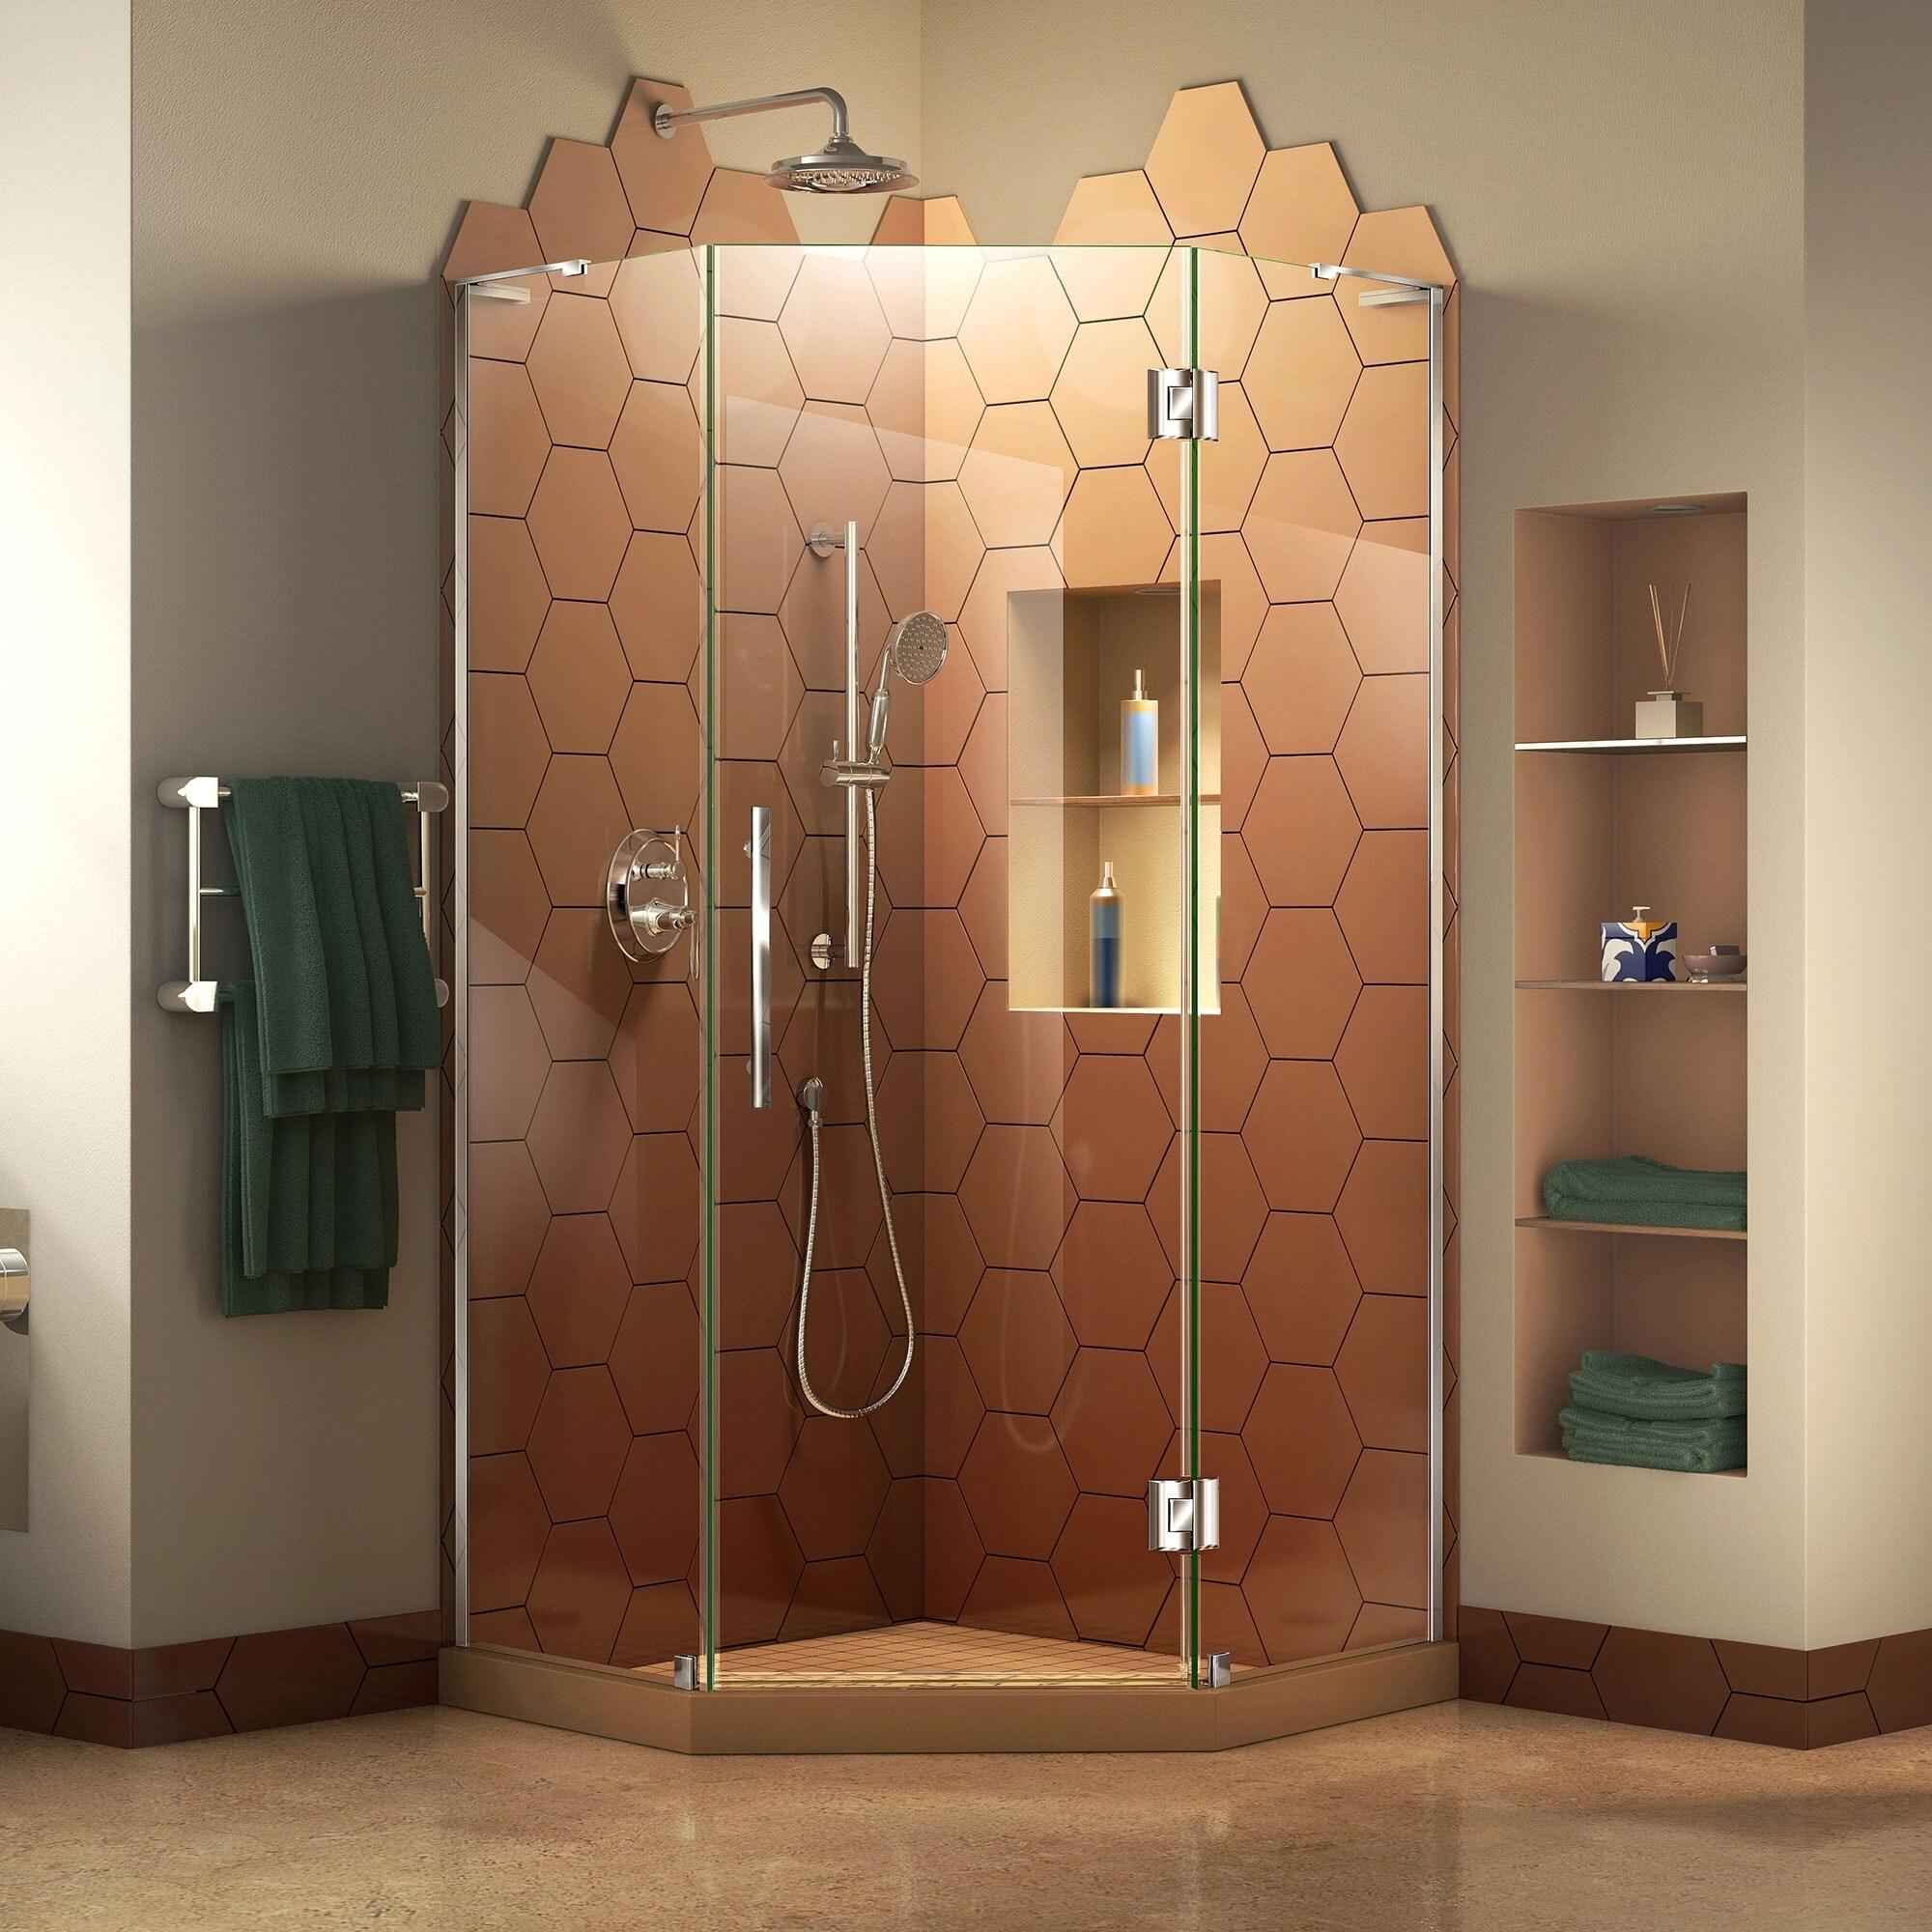 Buy Hinged Shower Doors Online At Overstock Our Best